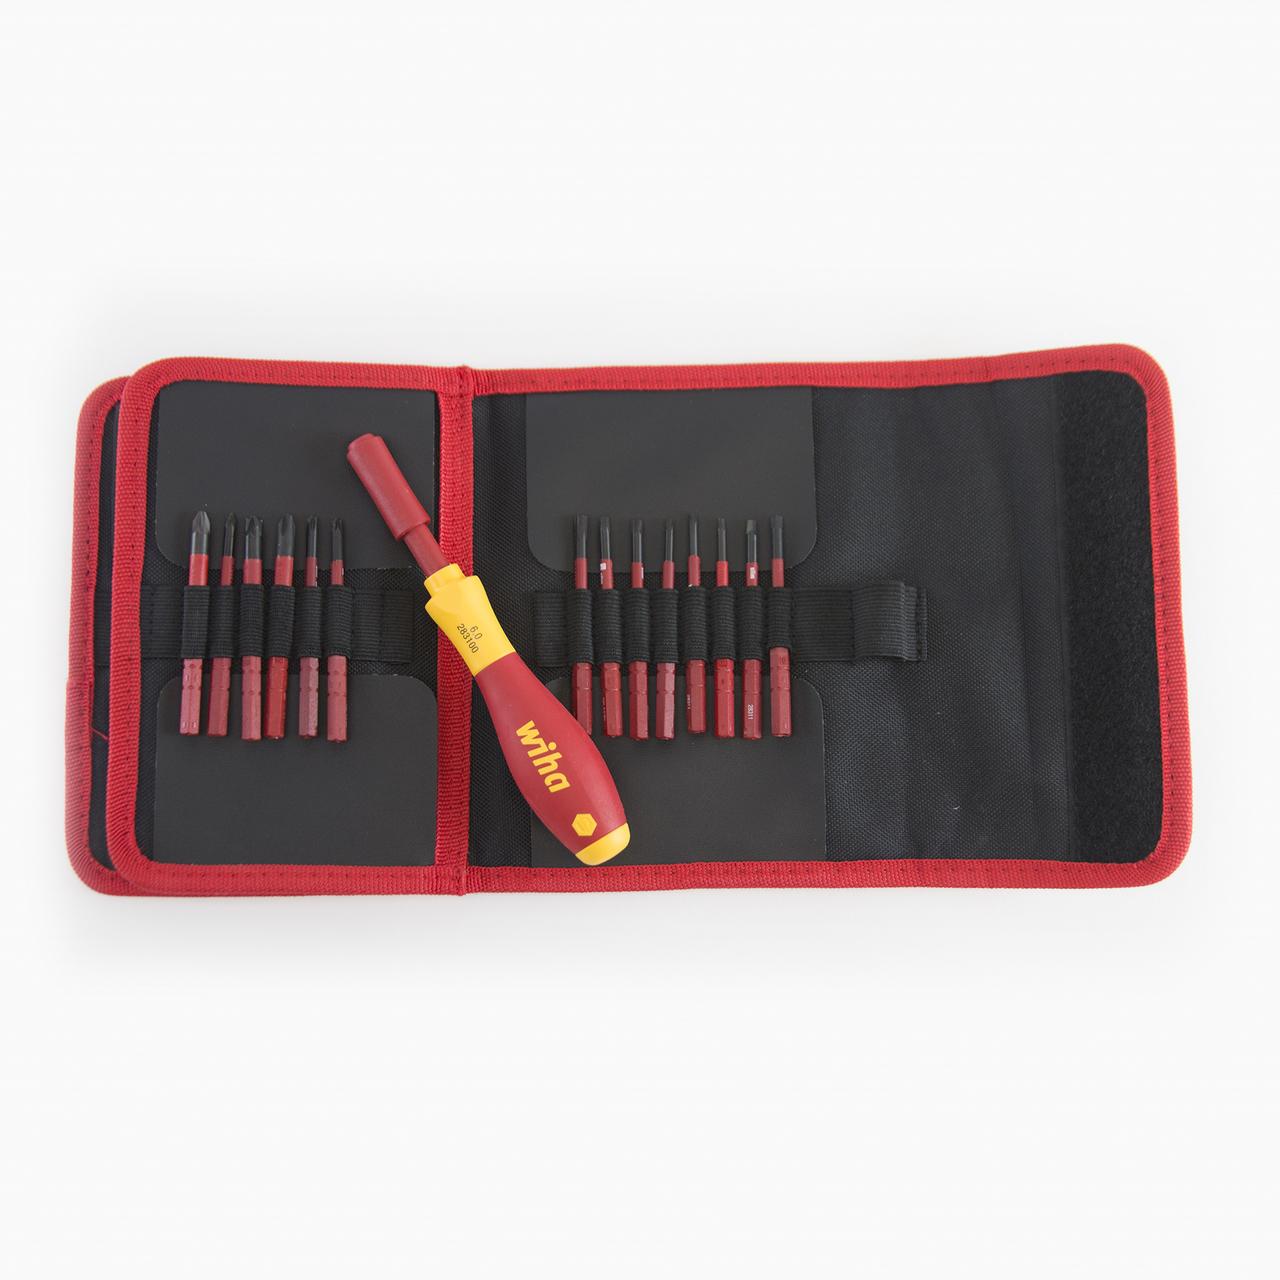 Wiha 28399 30 Piece Insulated SlimLine Blade Pouch Set